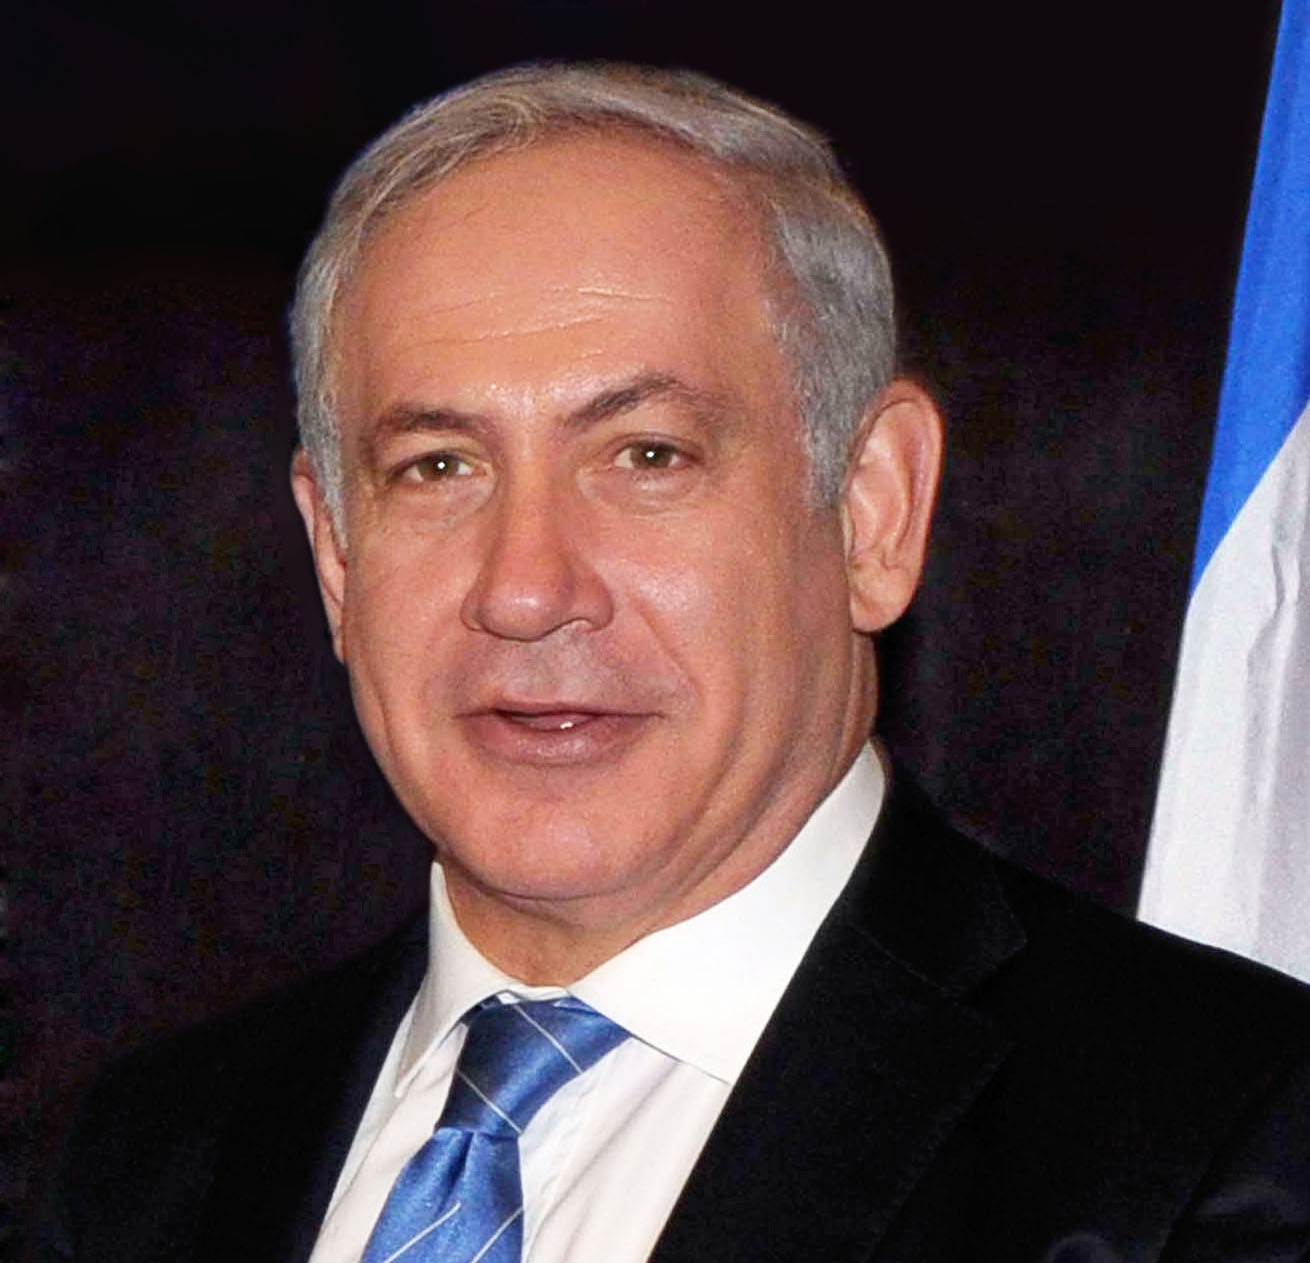 https://i1.wp.com/www.chiourim.com/wp-content/uploads/2015/02/Benjamin_Netanyahu_portrait-1.jpg